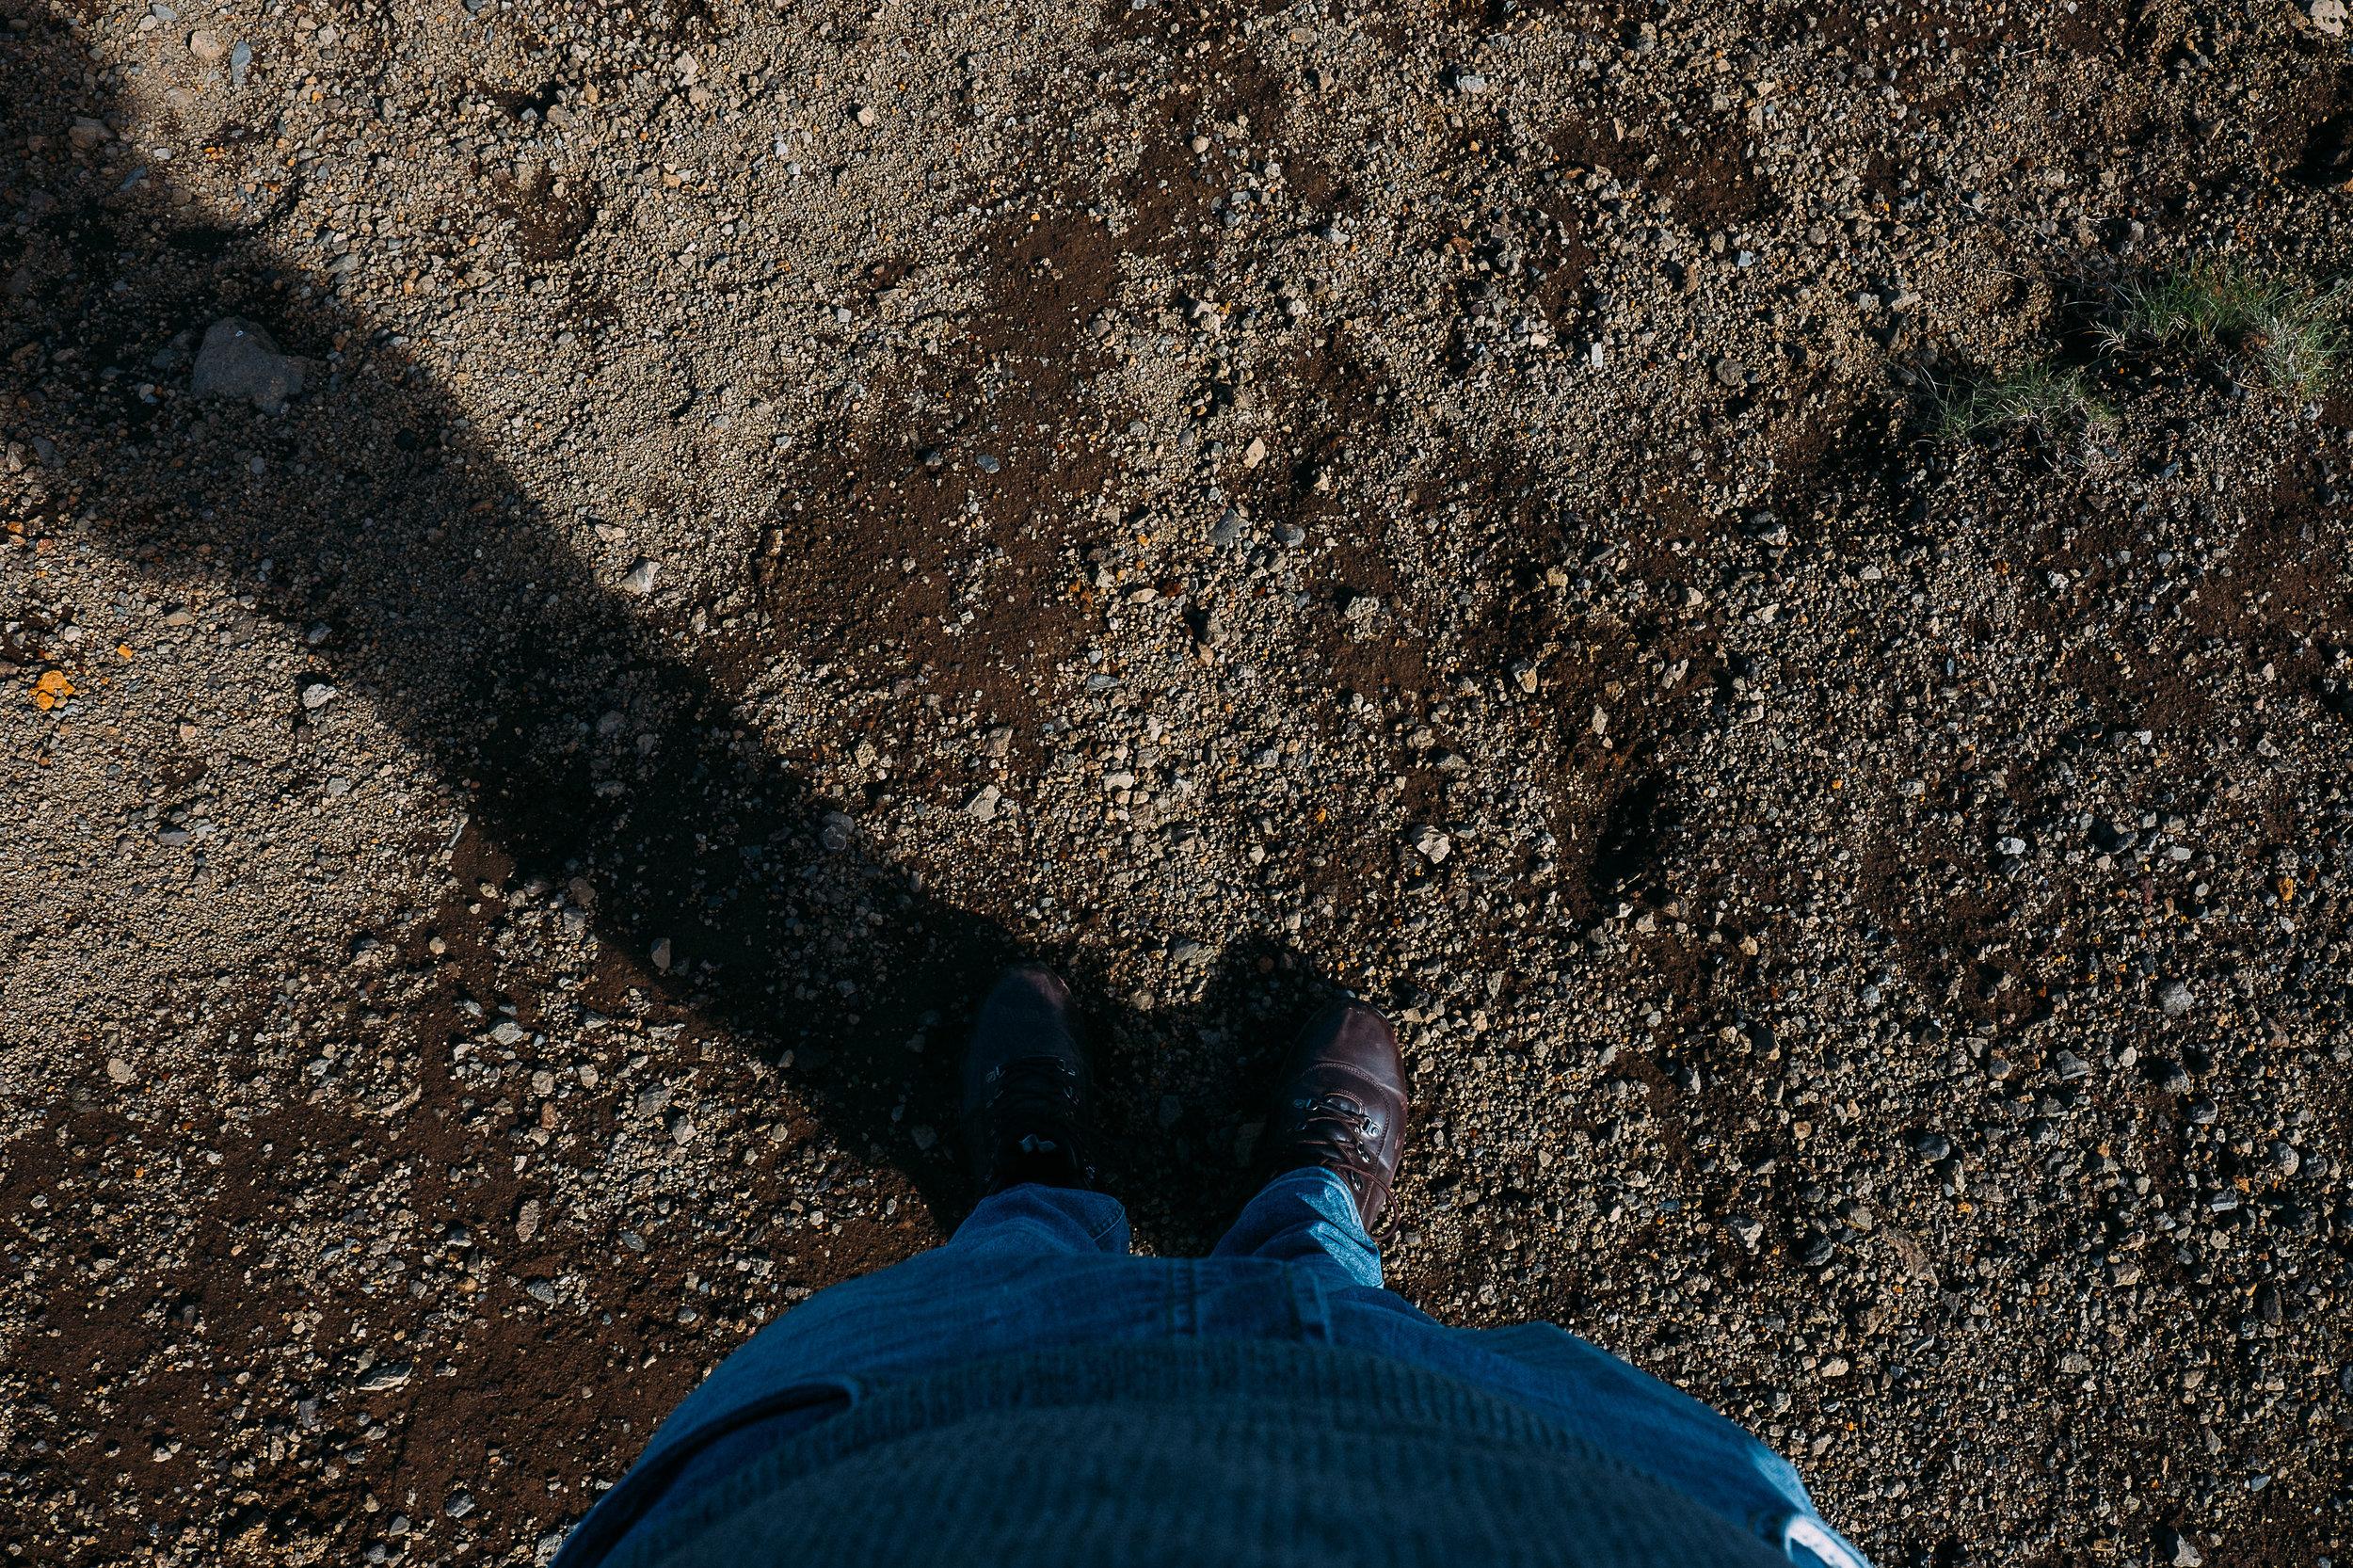 iceland feet-5.jpg